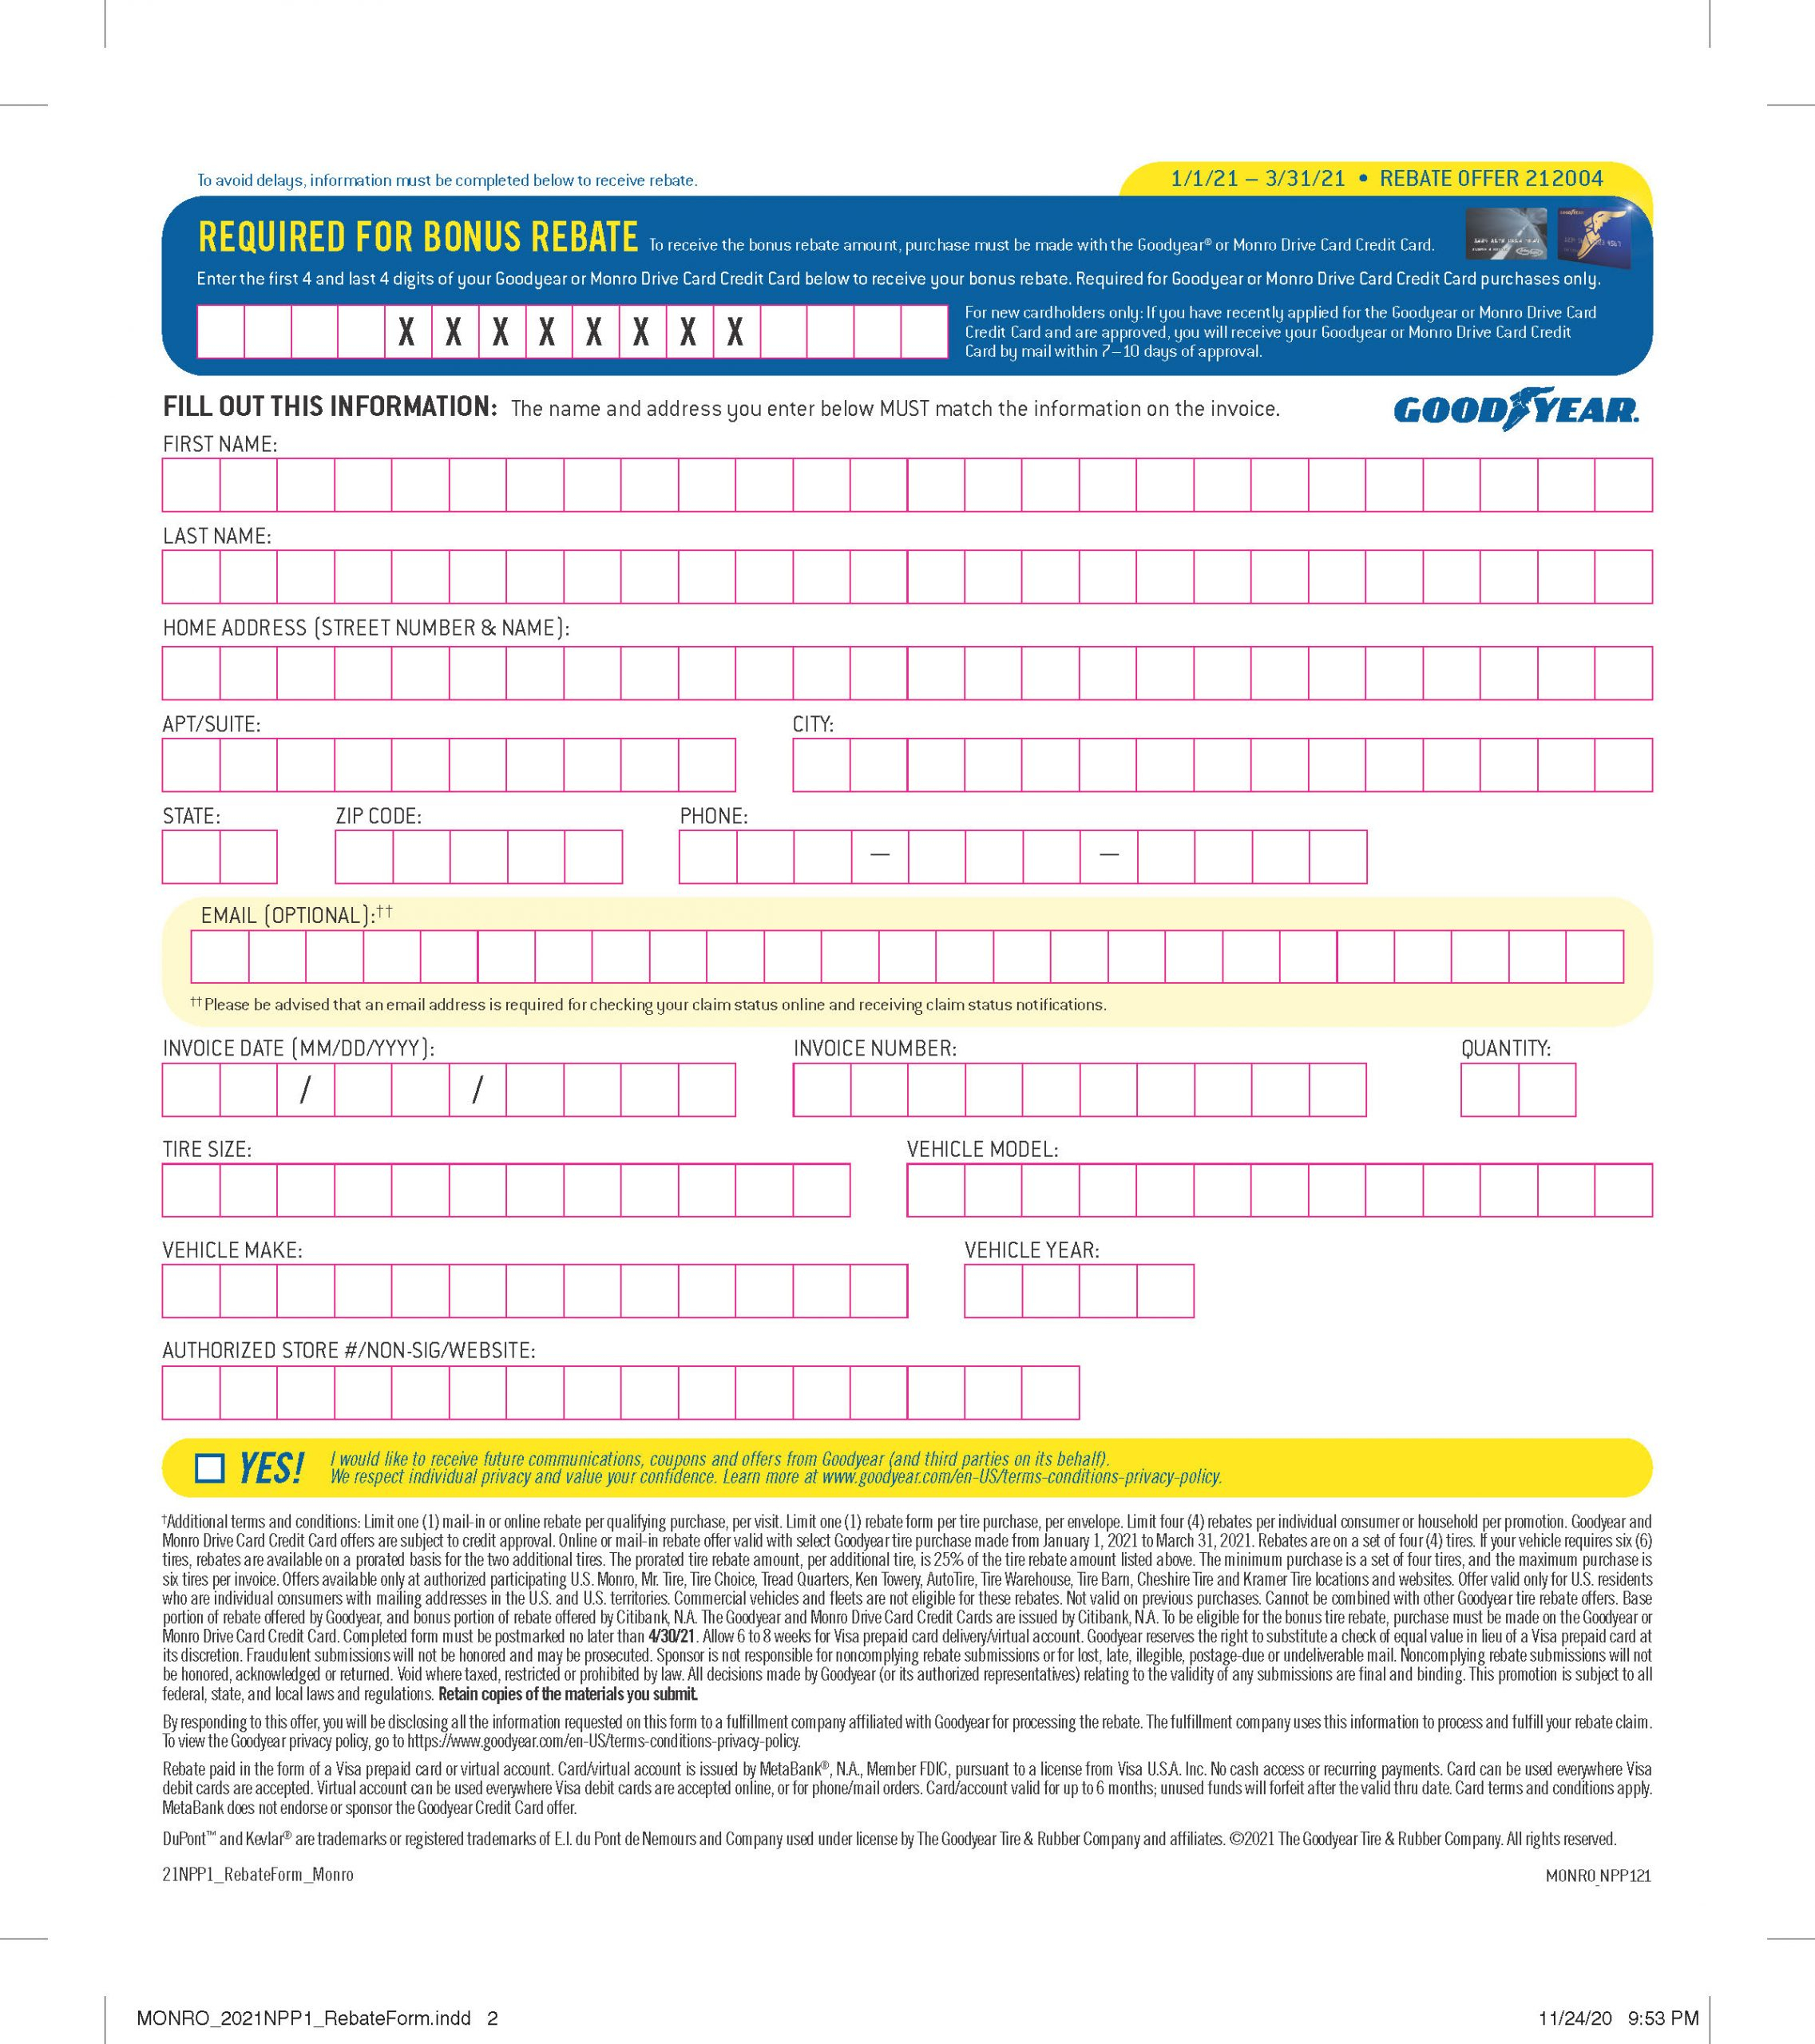 Menards Rebate Form March 2021